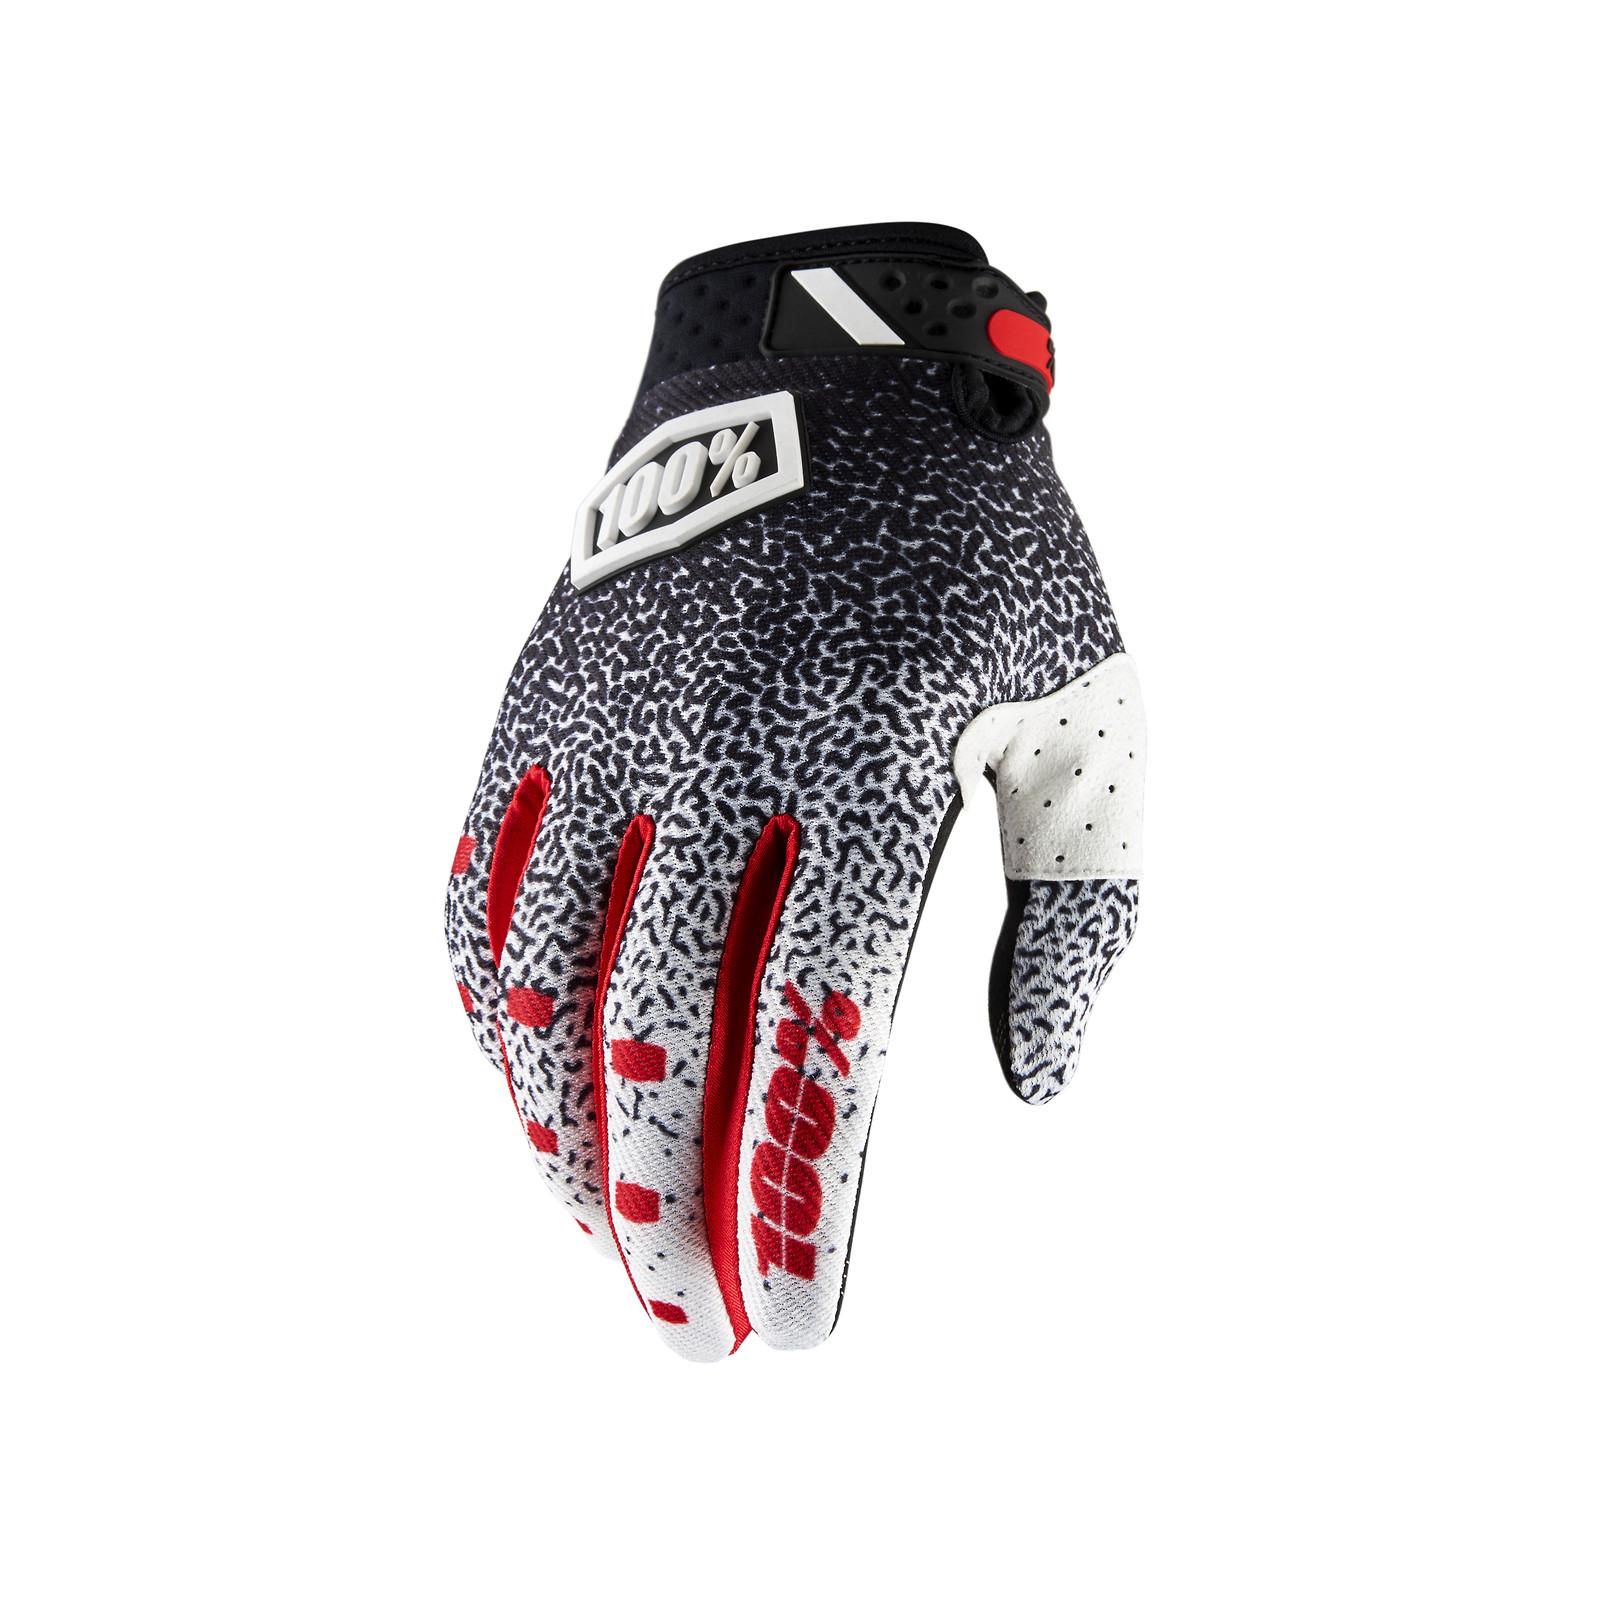 Ridefit Glove - Black / White - 100percent - Motocross Pictures - Vital MX